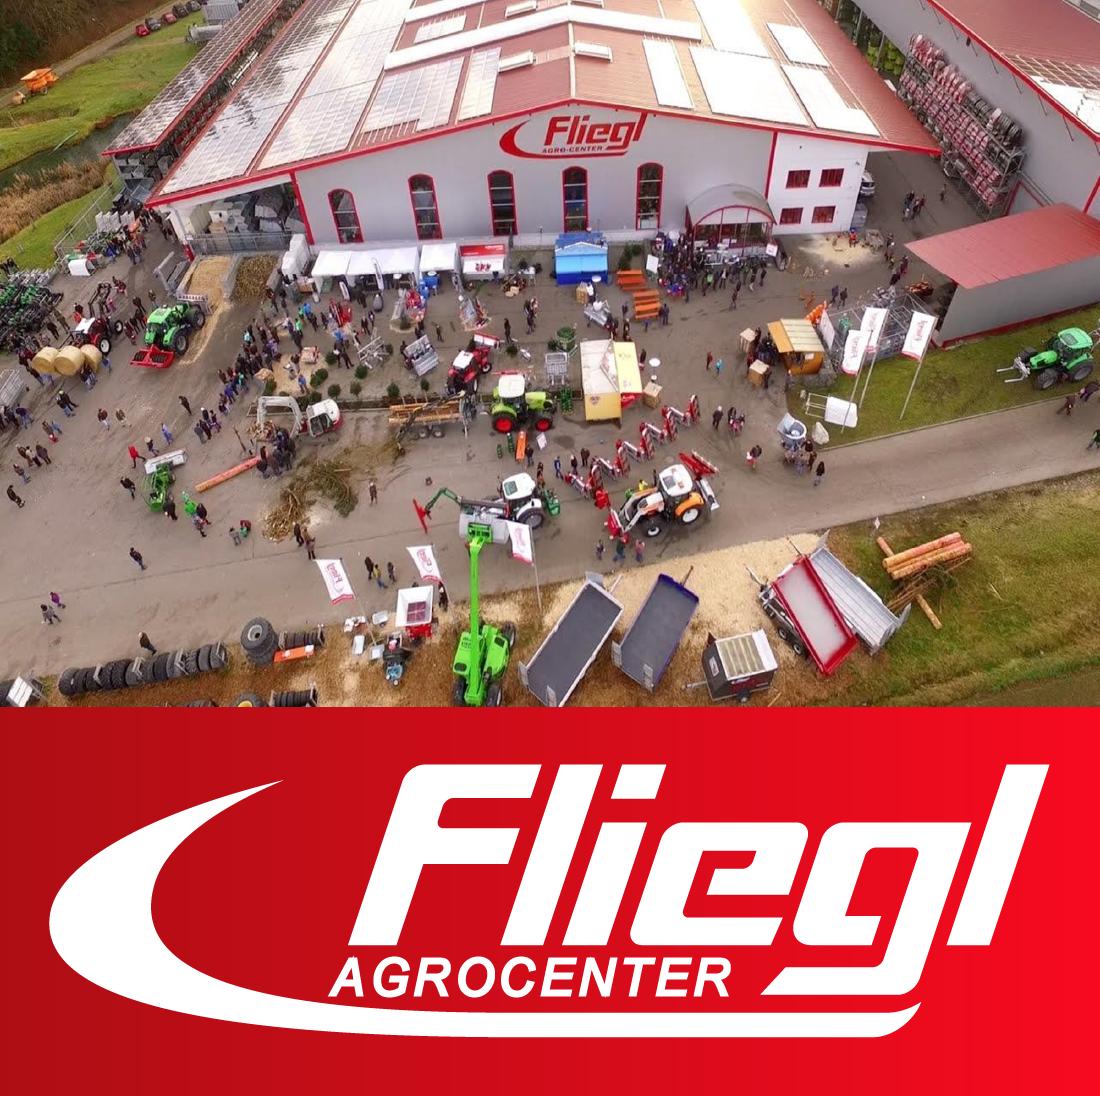 Agrocenter1